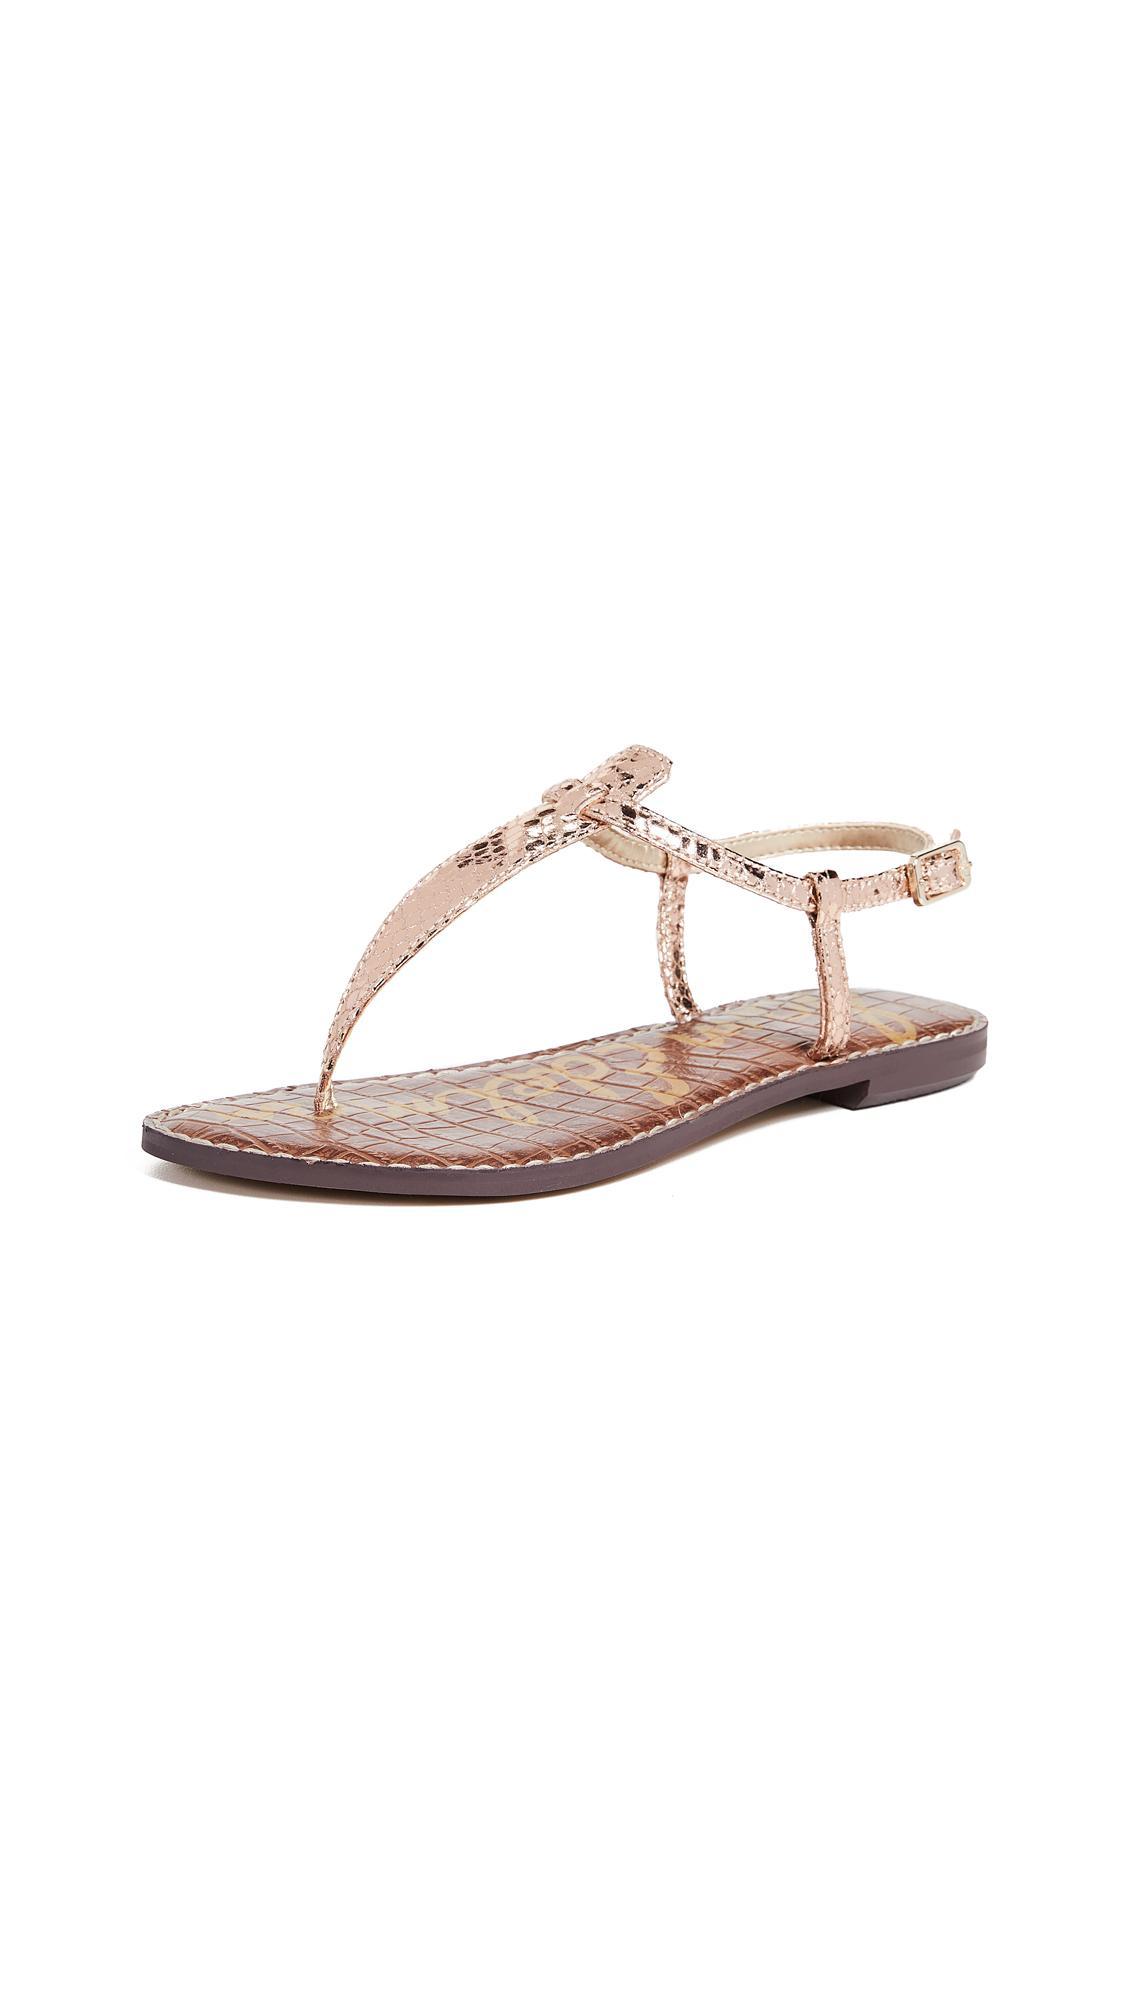 4376d06fe Sam Edelman Gigi Flat Sandals In Rose Gold